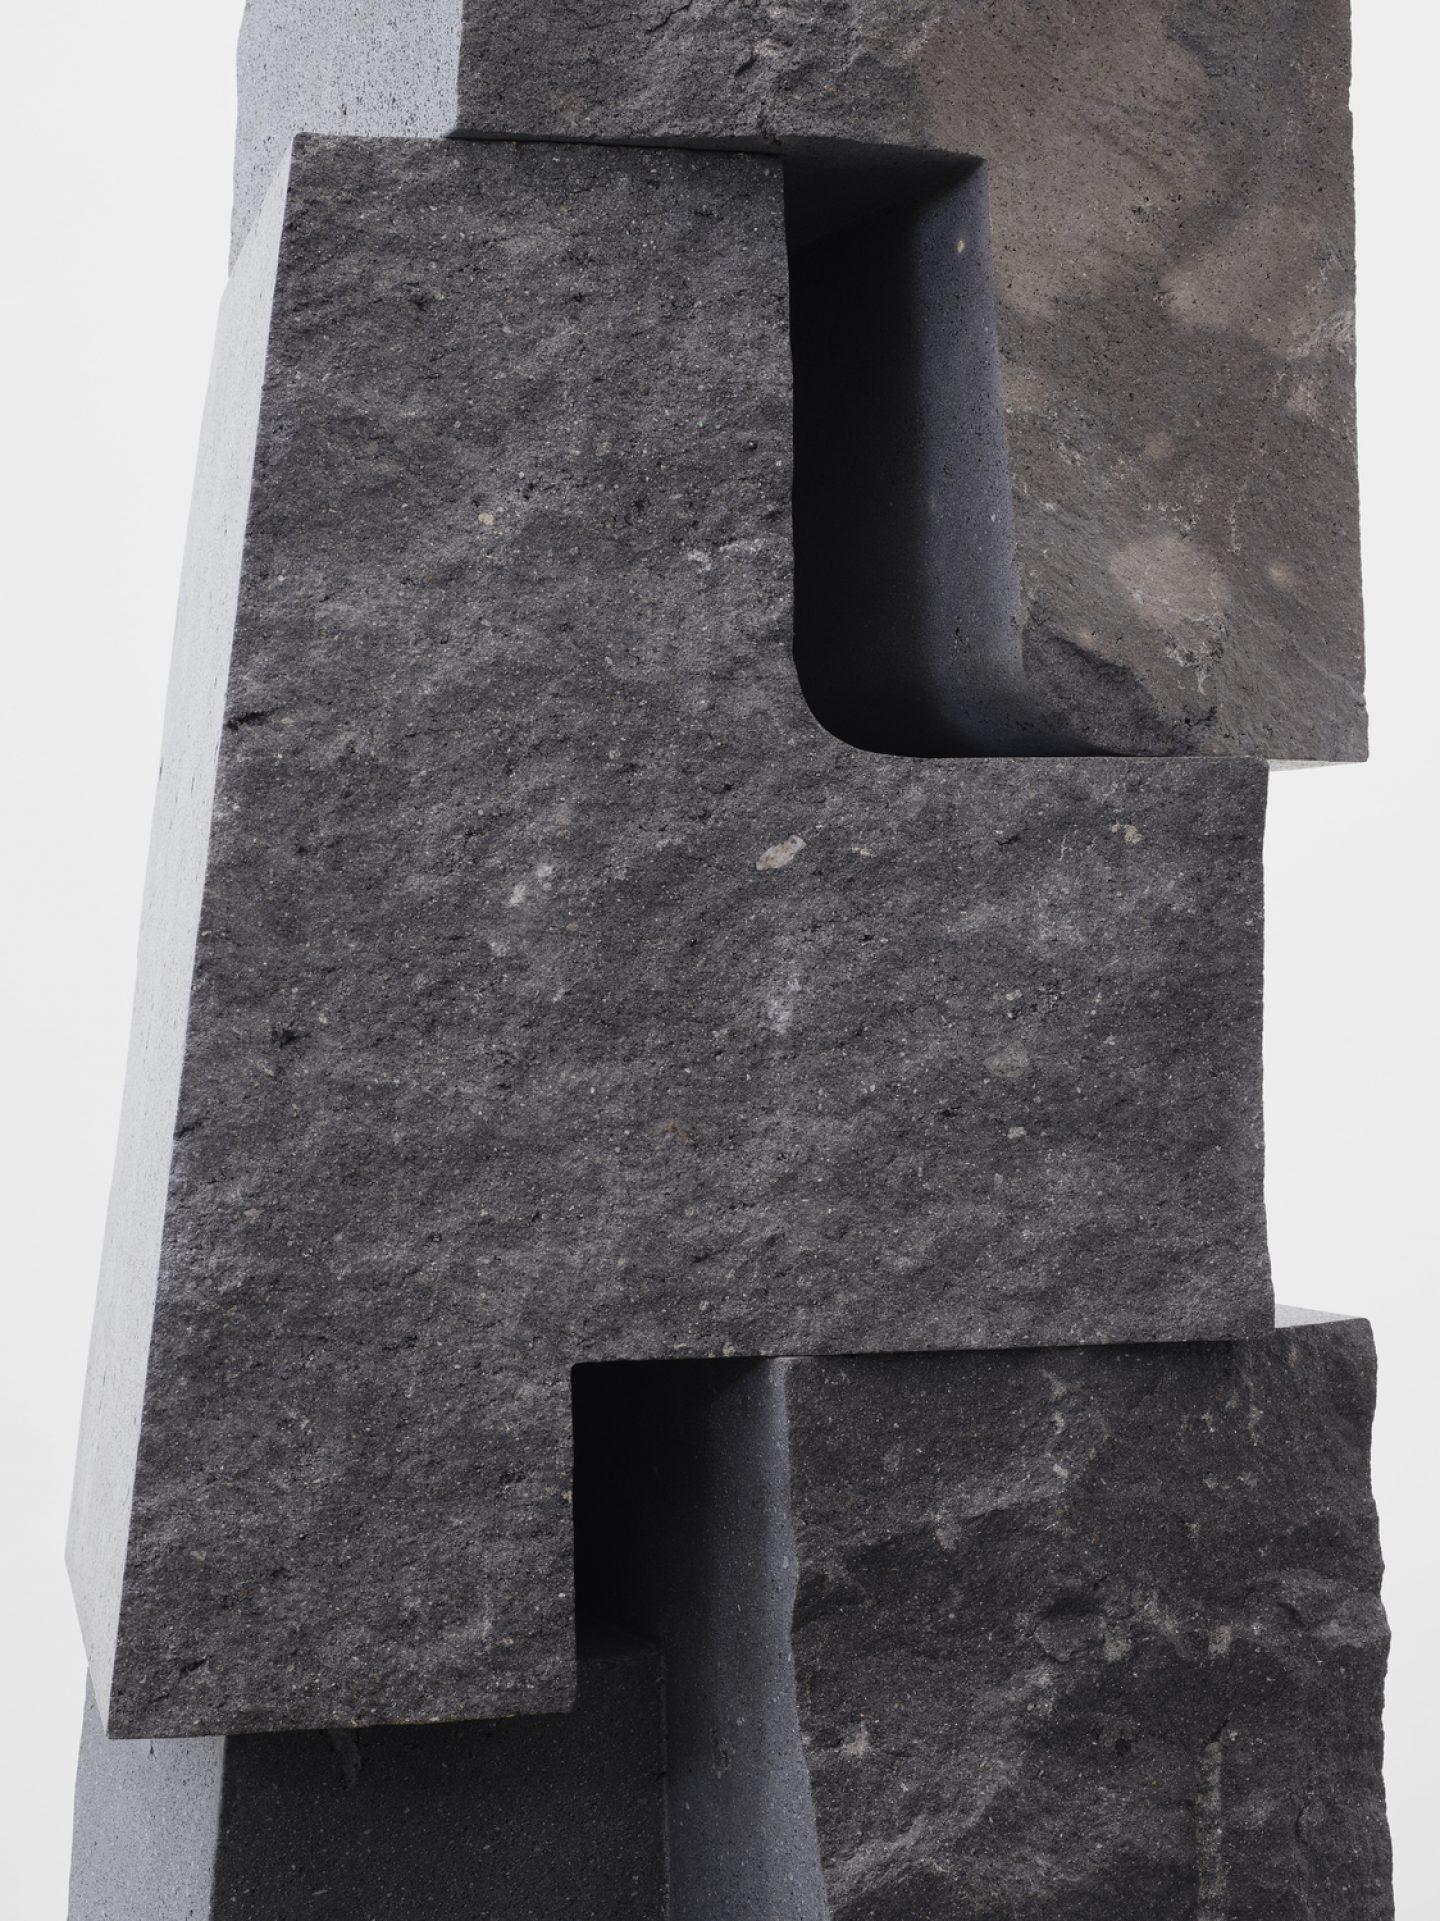 IGNANT-ART-Sculpture-Reyes-02